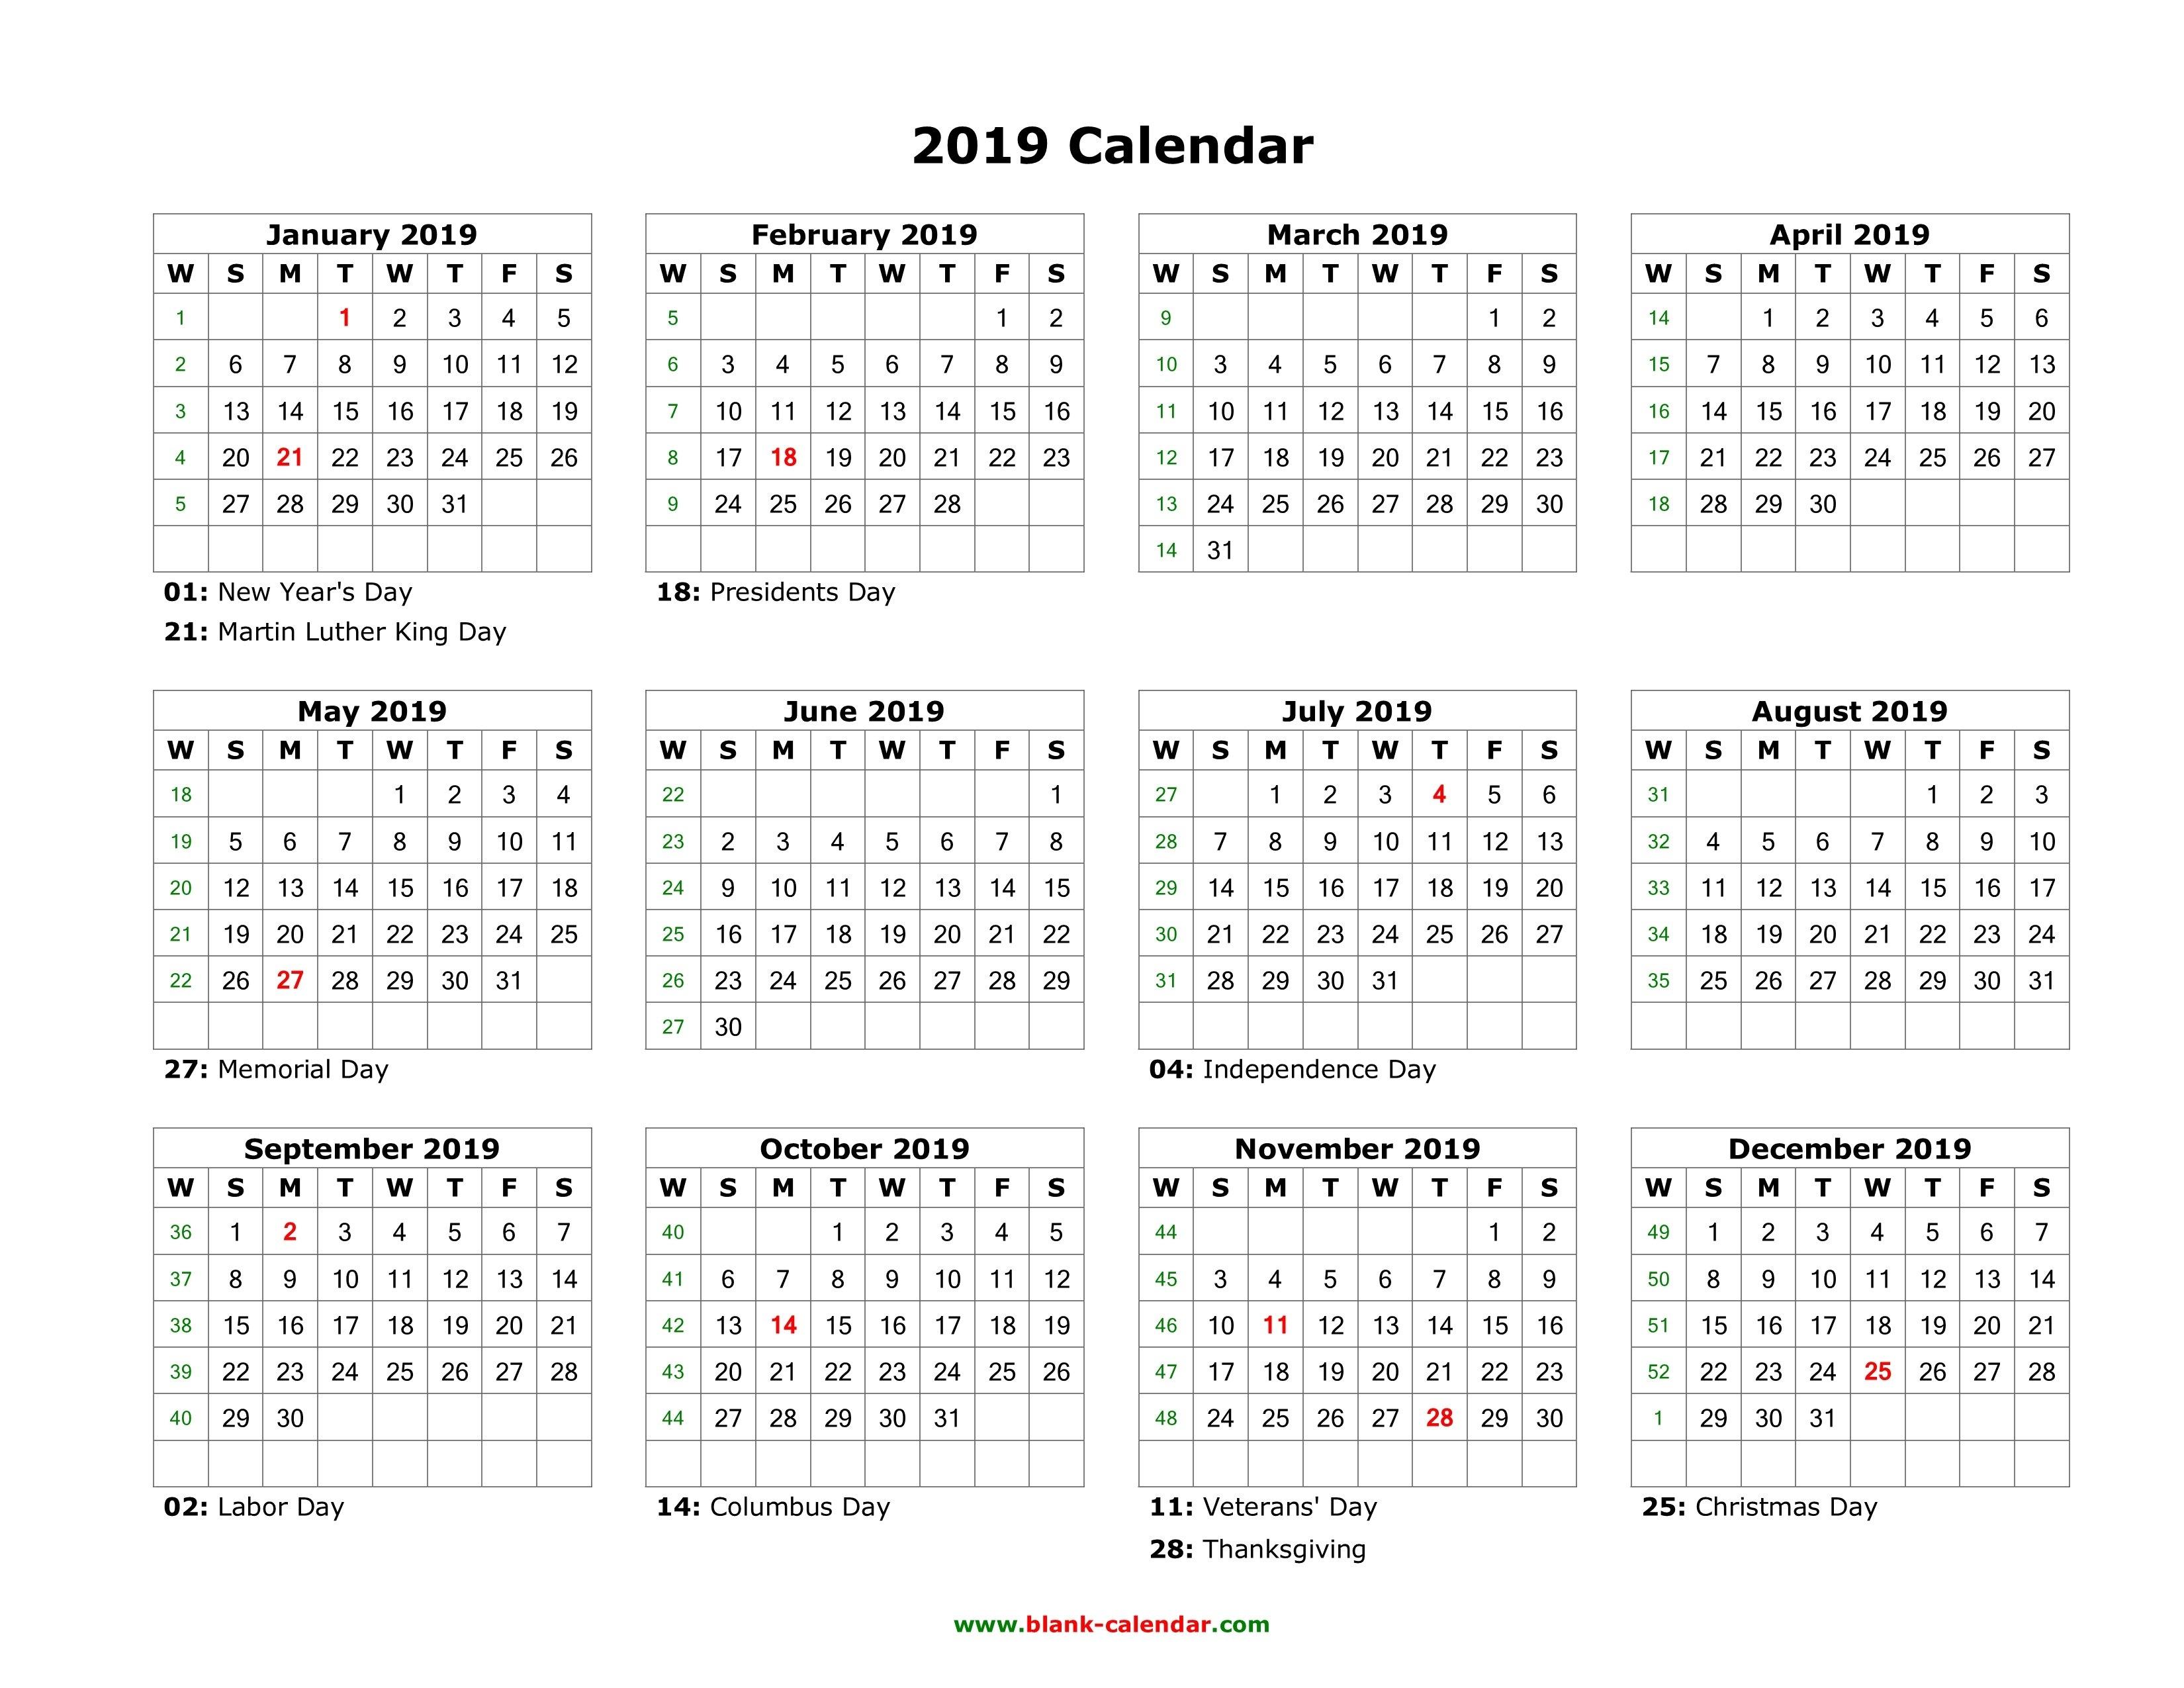 Blank Calendar 2019   Free Download Calendar Templates 1 Year Calendar 2019